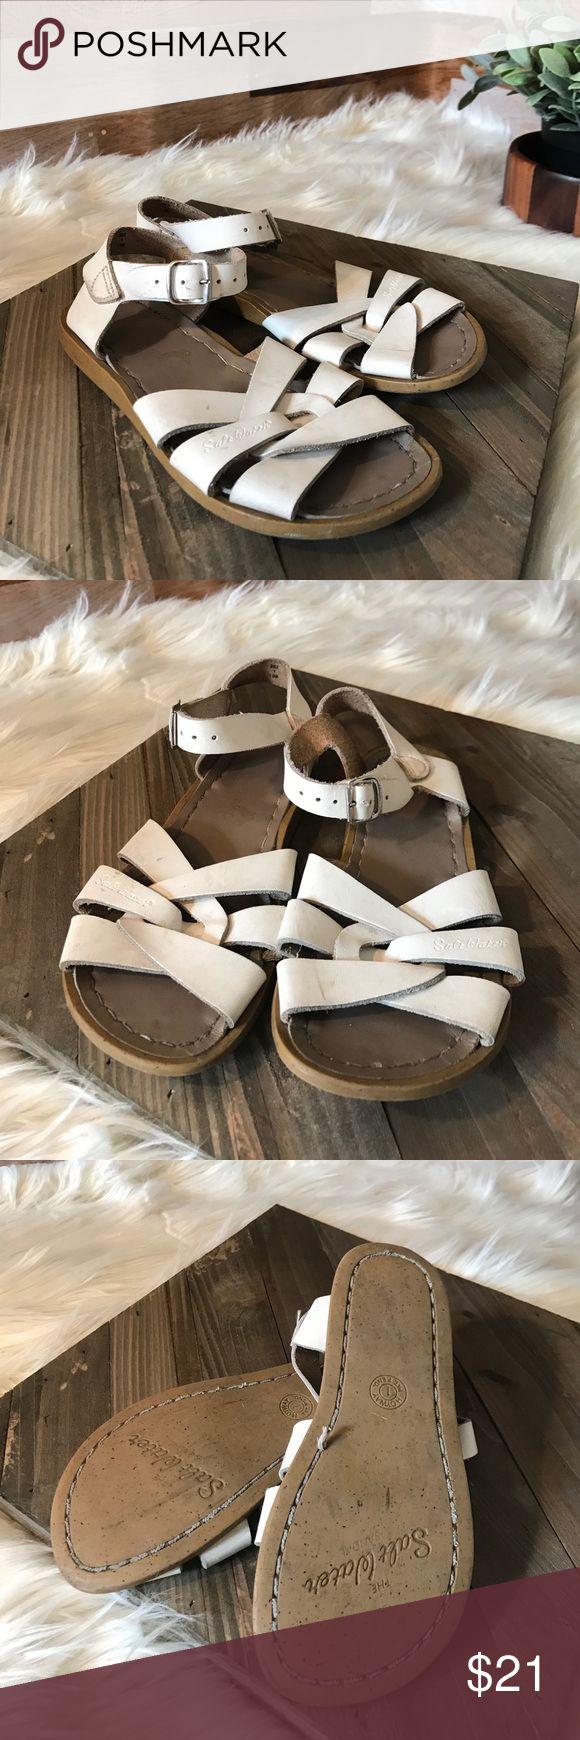 Girls white Salt Water Sandals Girls white Salt Water Sandals, used condition. Salt Water Sandals by Hoy Shoes Sandals & Flip Flops